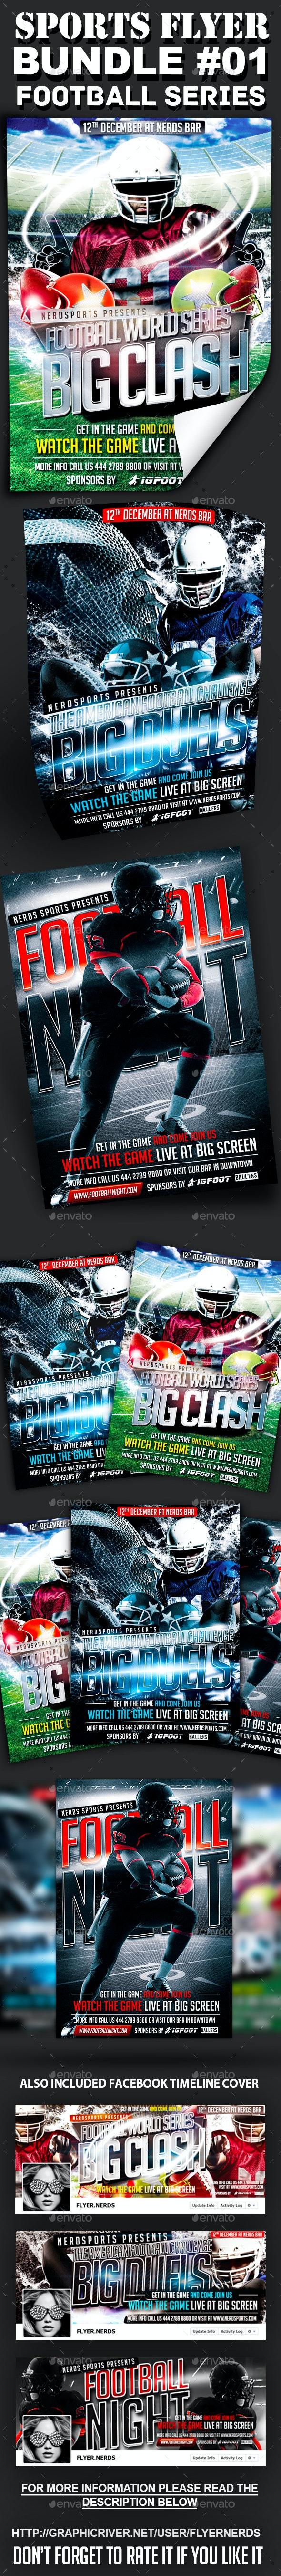 Sports Flyer Bundle 01 Football Series - Sports Events